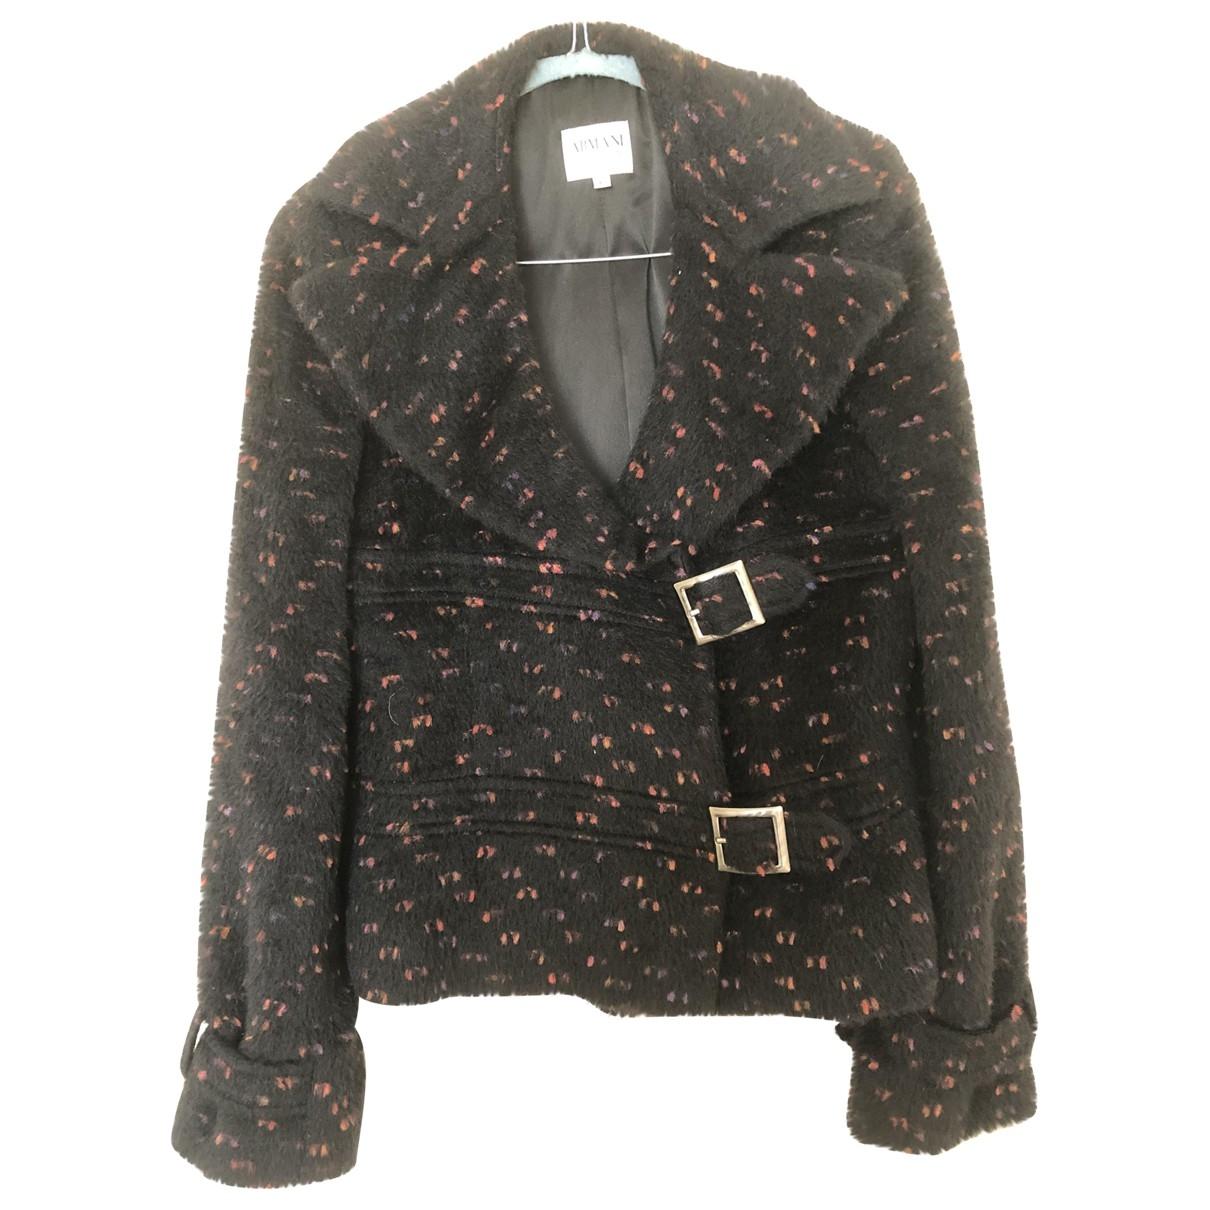 Armani Collezioni \N Black Wool jacket for Women 40 IT